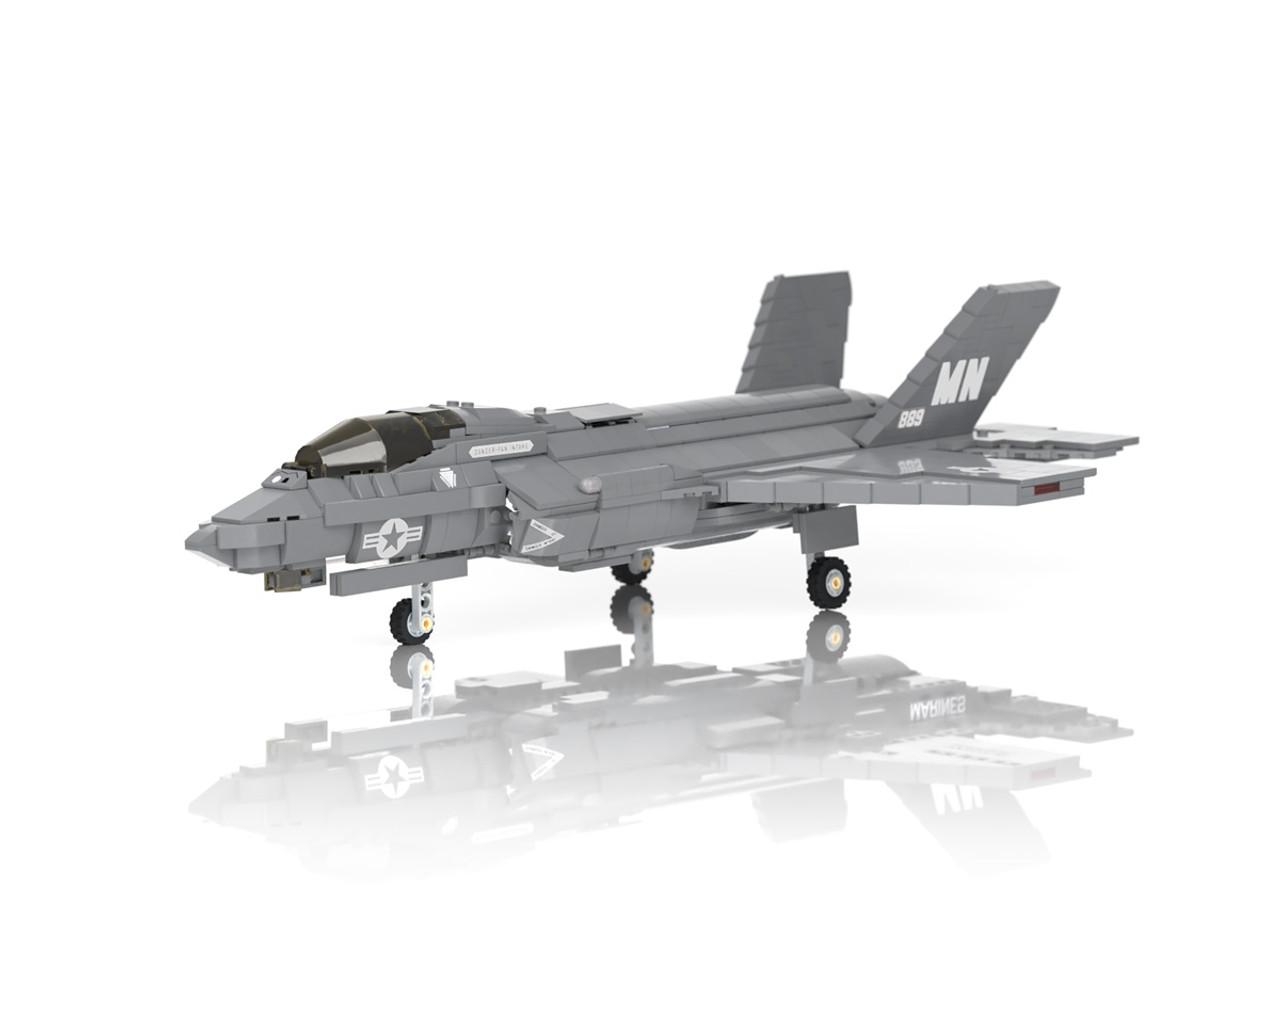 F-35B Lightning II - STOVL Stealth Multirole Fighter